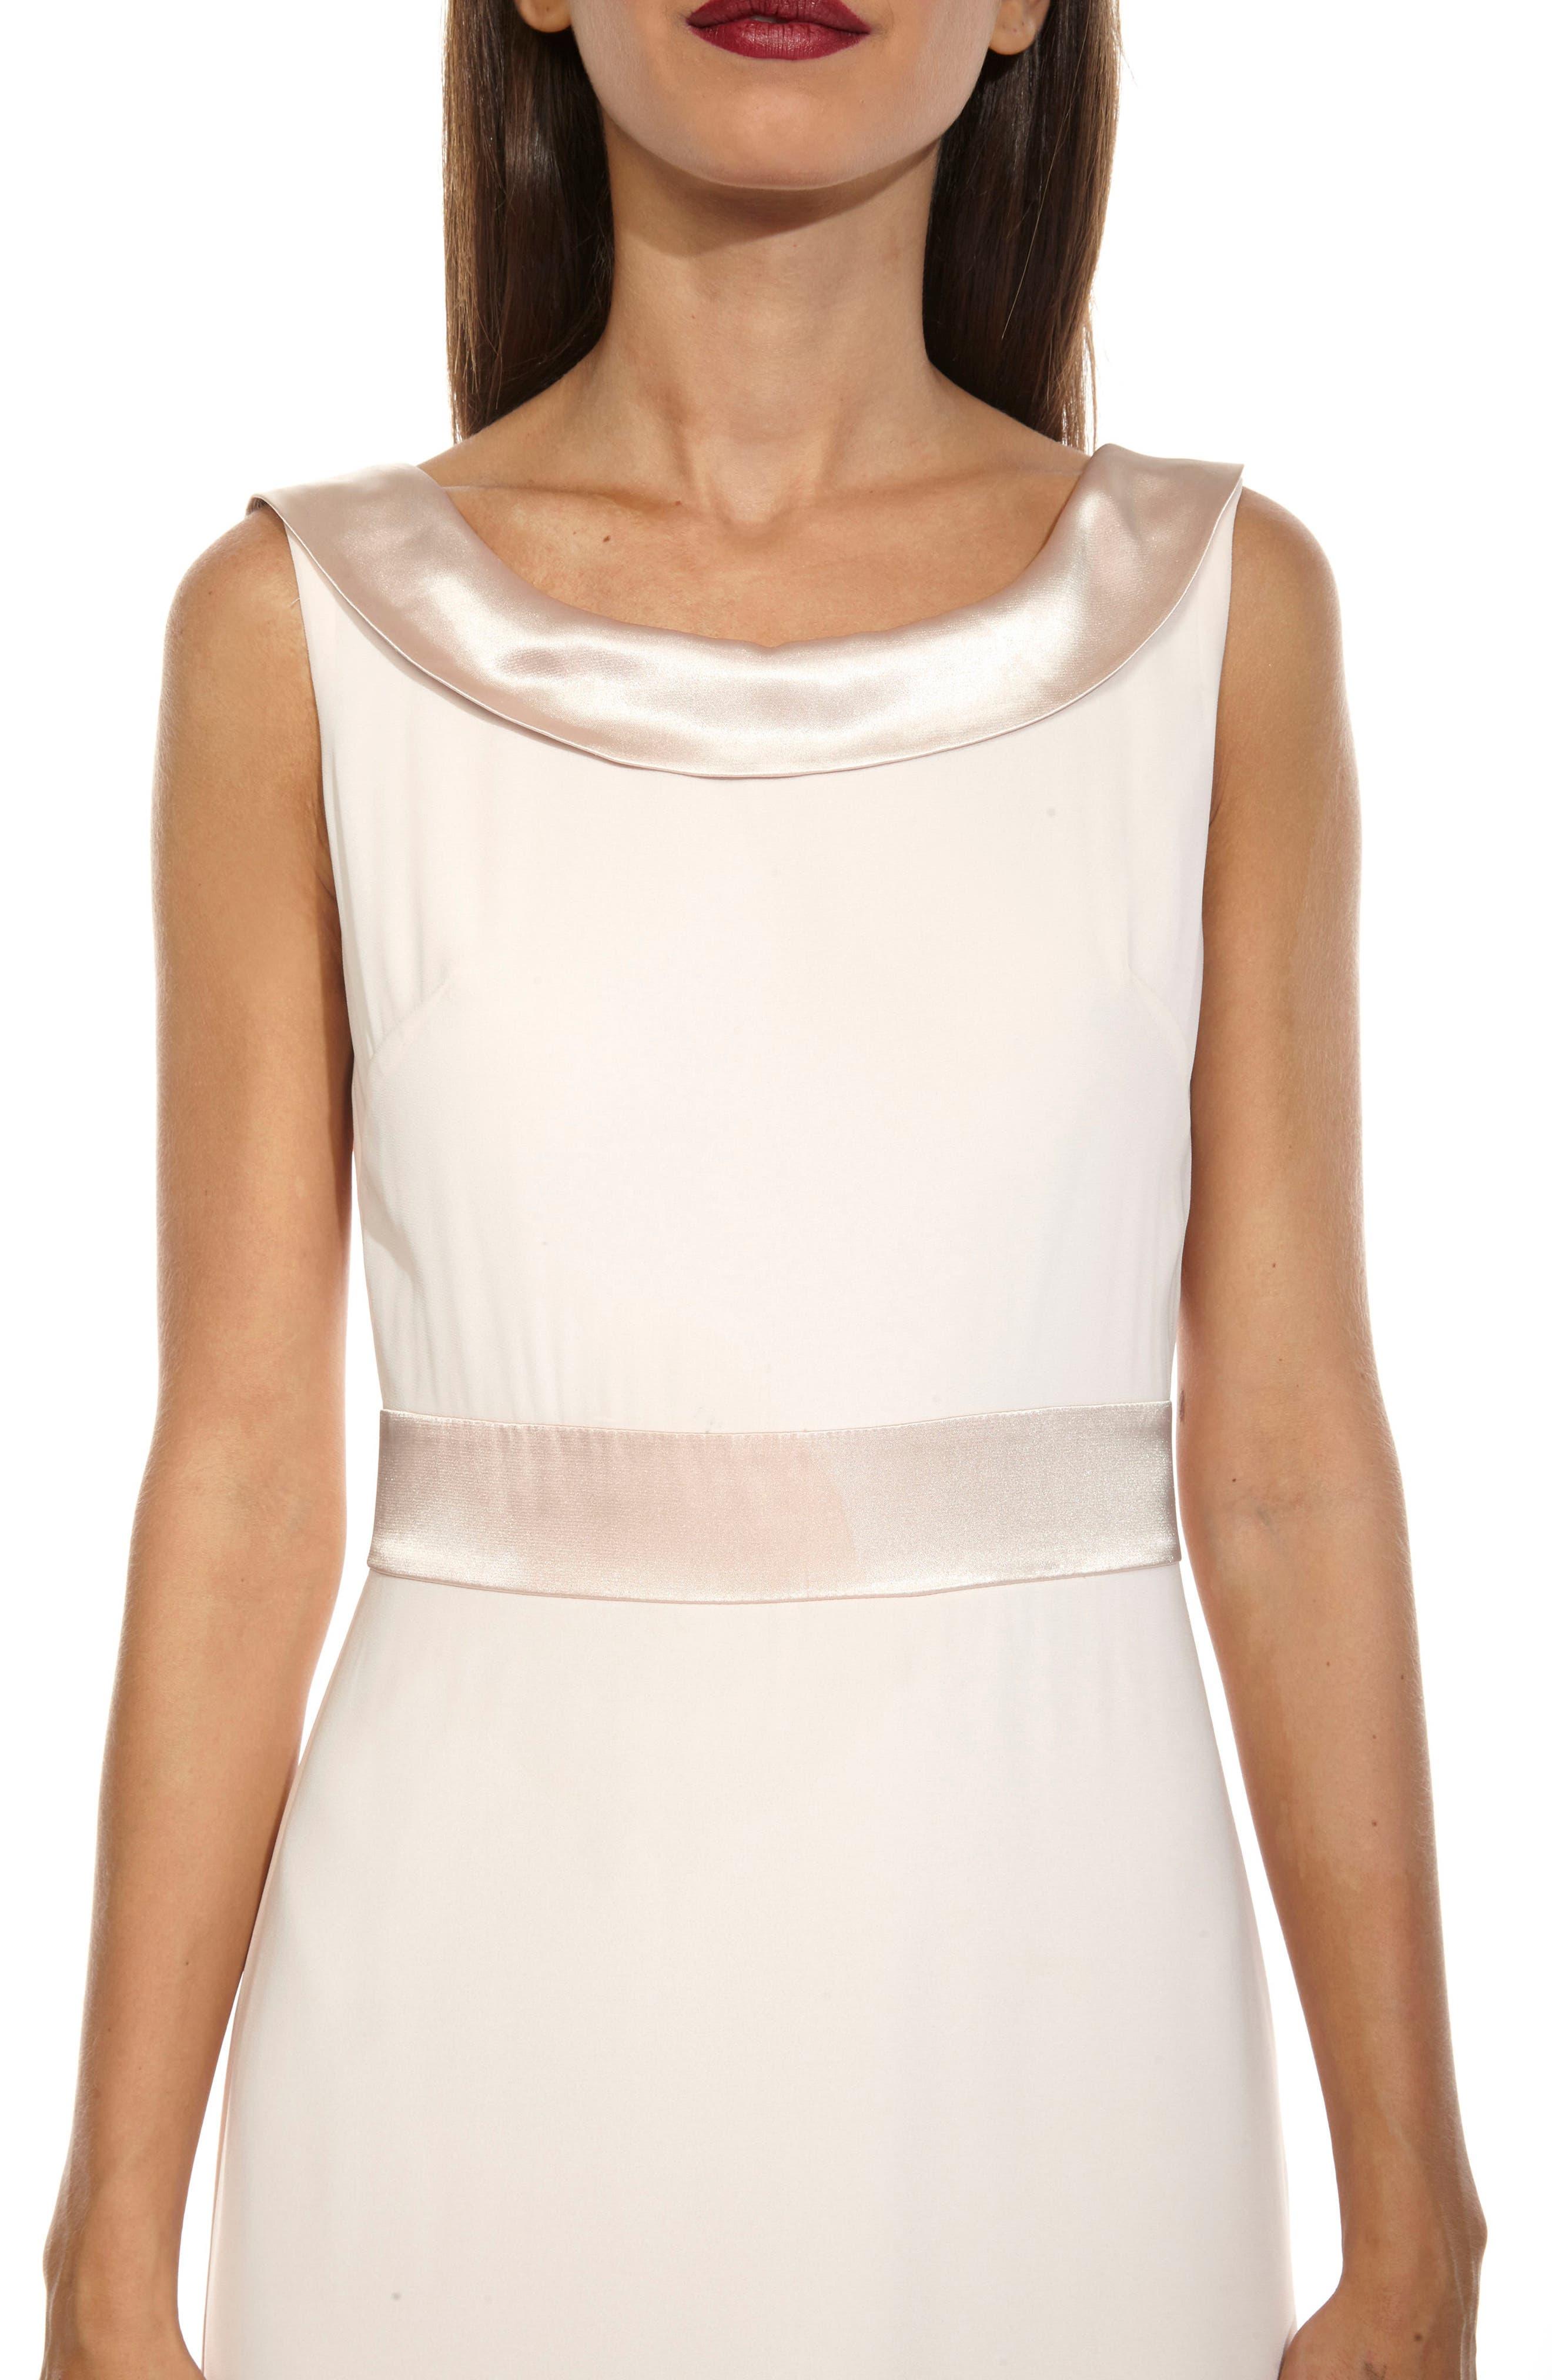 Daralls V-Back Maxi Dress,                             Alternate thumbnail 4, color,                             280